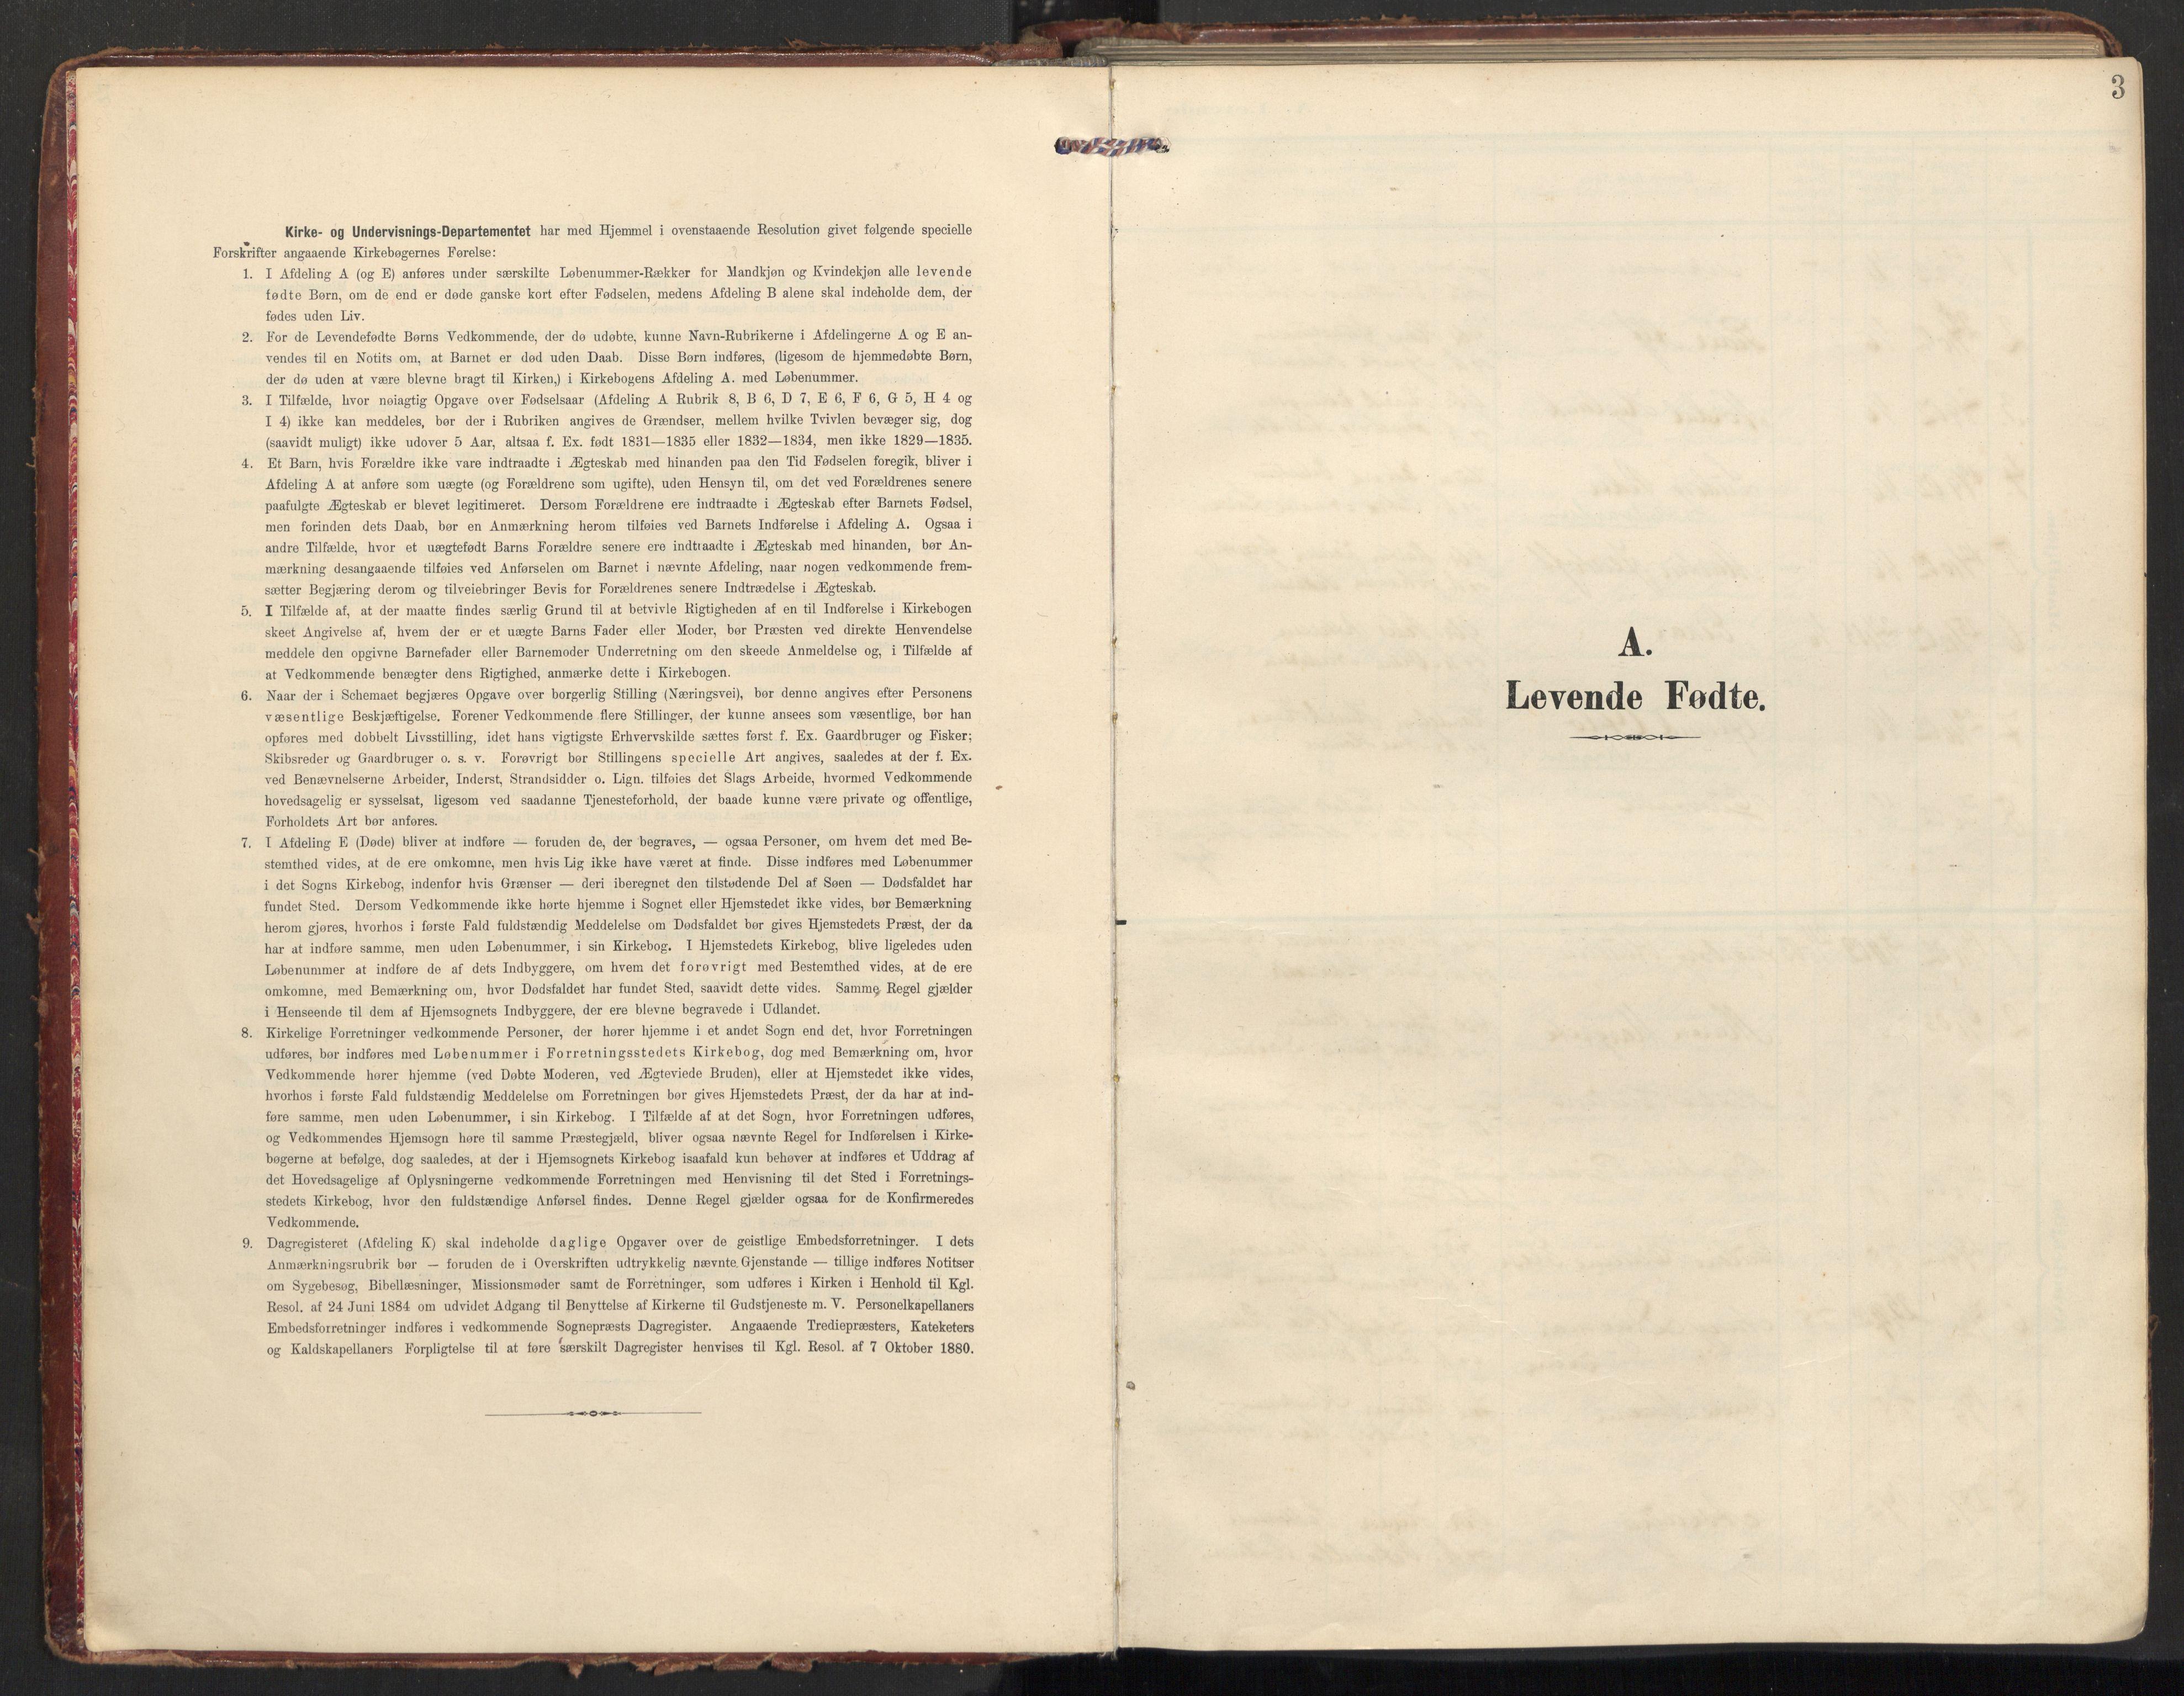 SAT, Ministerialprotokoller, klokkerbøker og fødselsregistre - Nordland, 890/L1287: Ministerialbok nr. 890A02, 1903-1915, s. 3